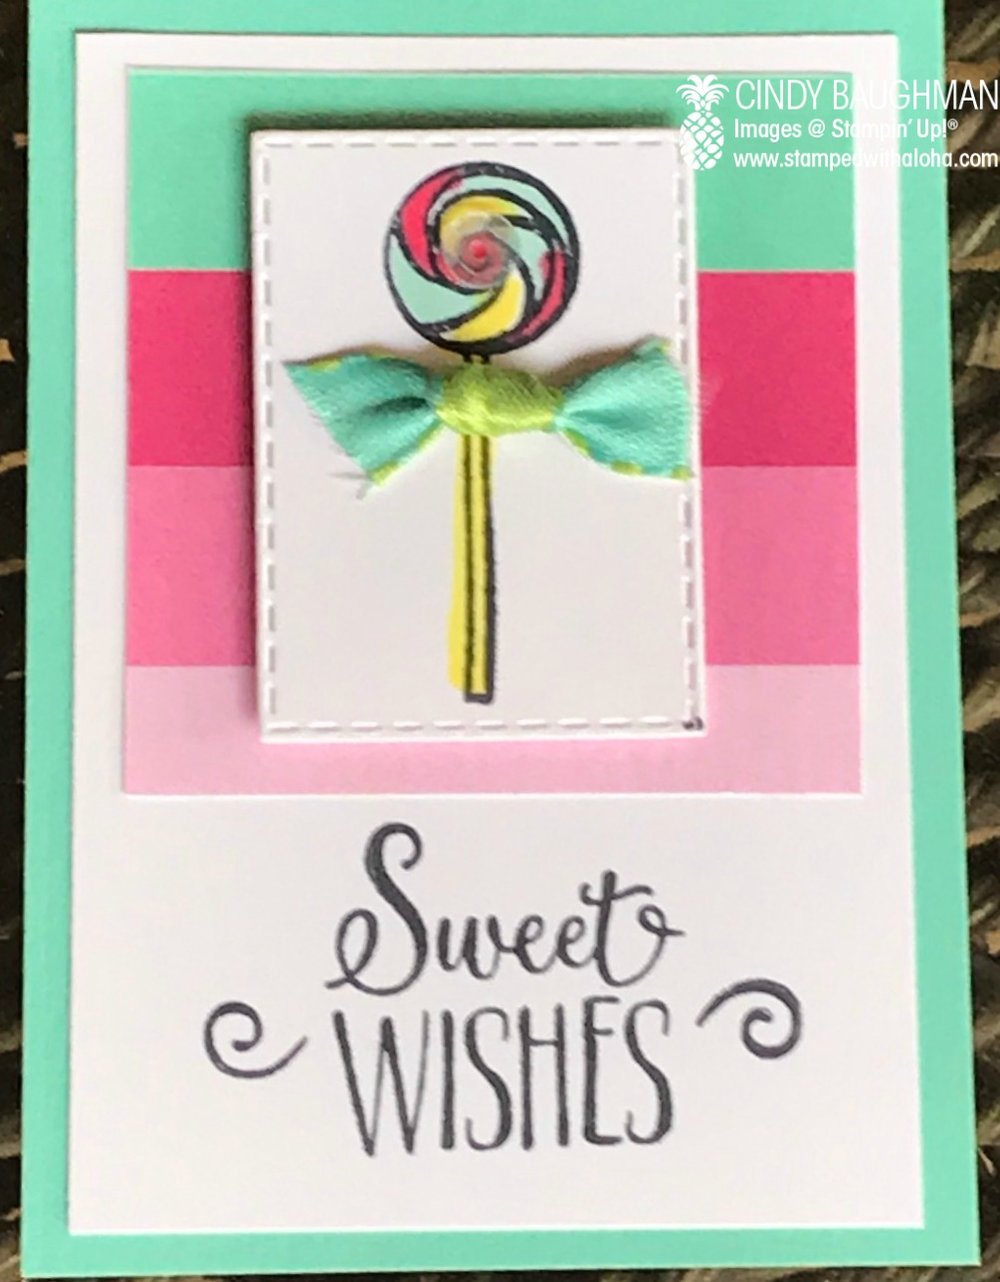 Lollipop Card Candy - stampedwithaloha.com